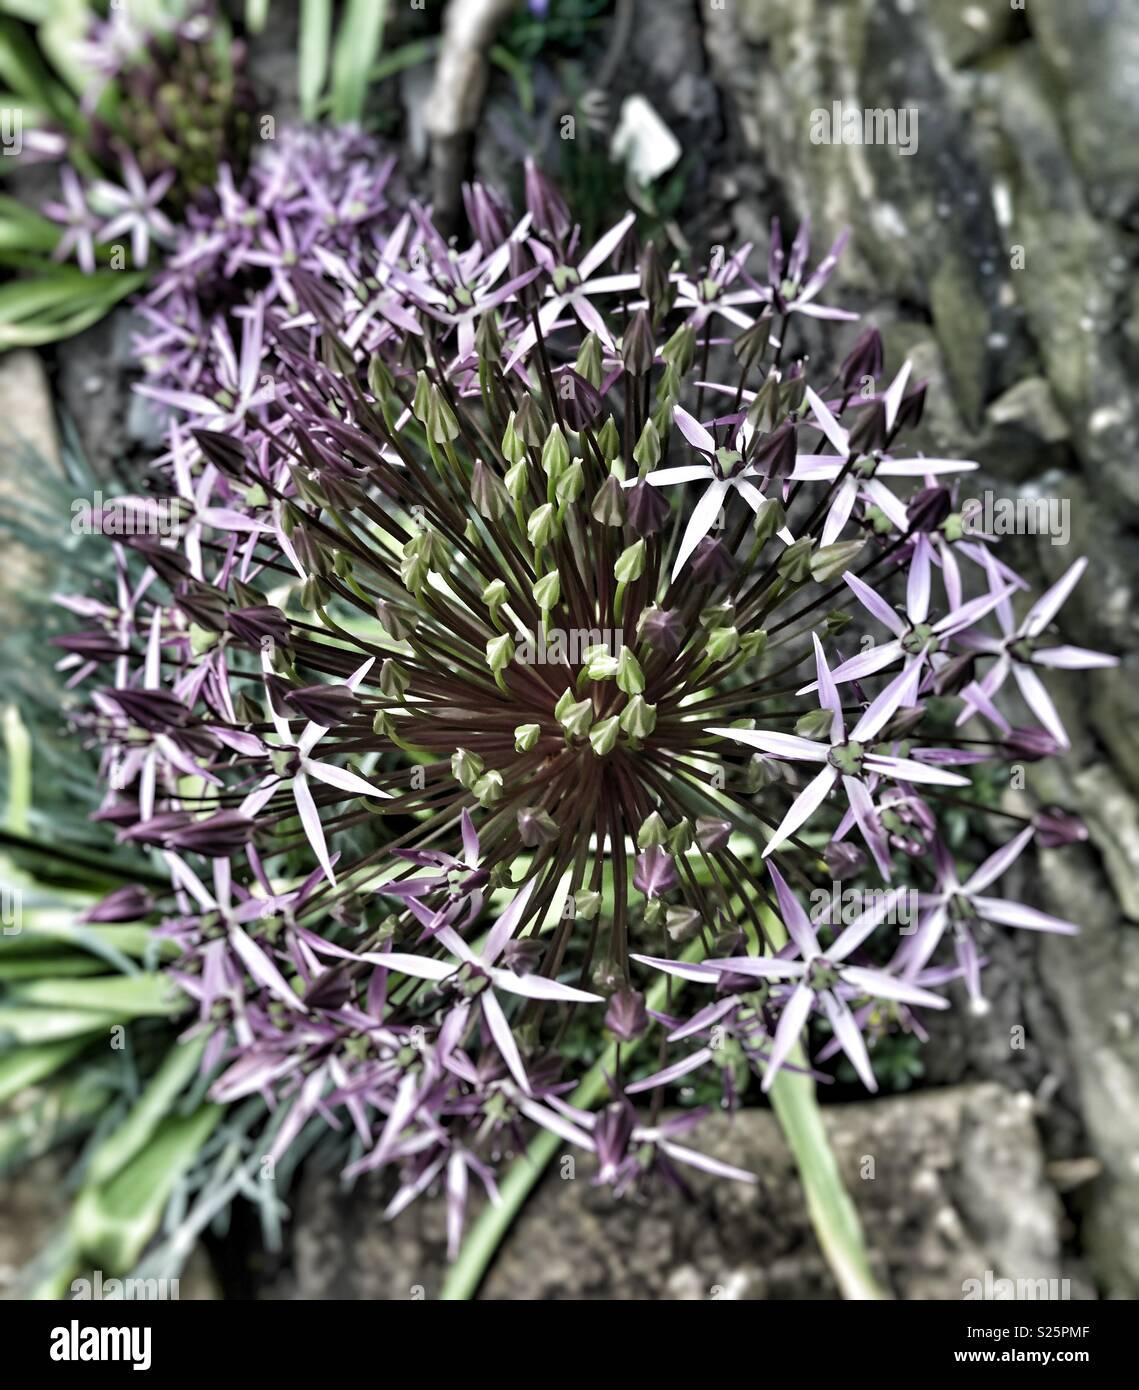 Half flowered purple Allium 'Firmamen' flower - Stock Image